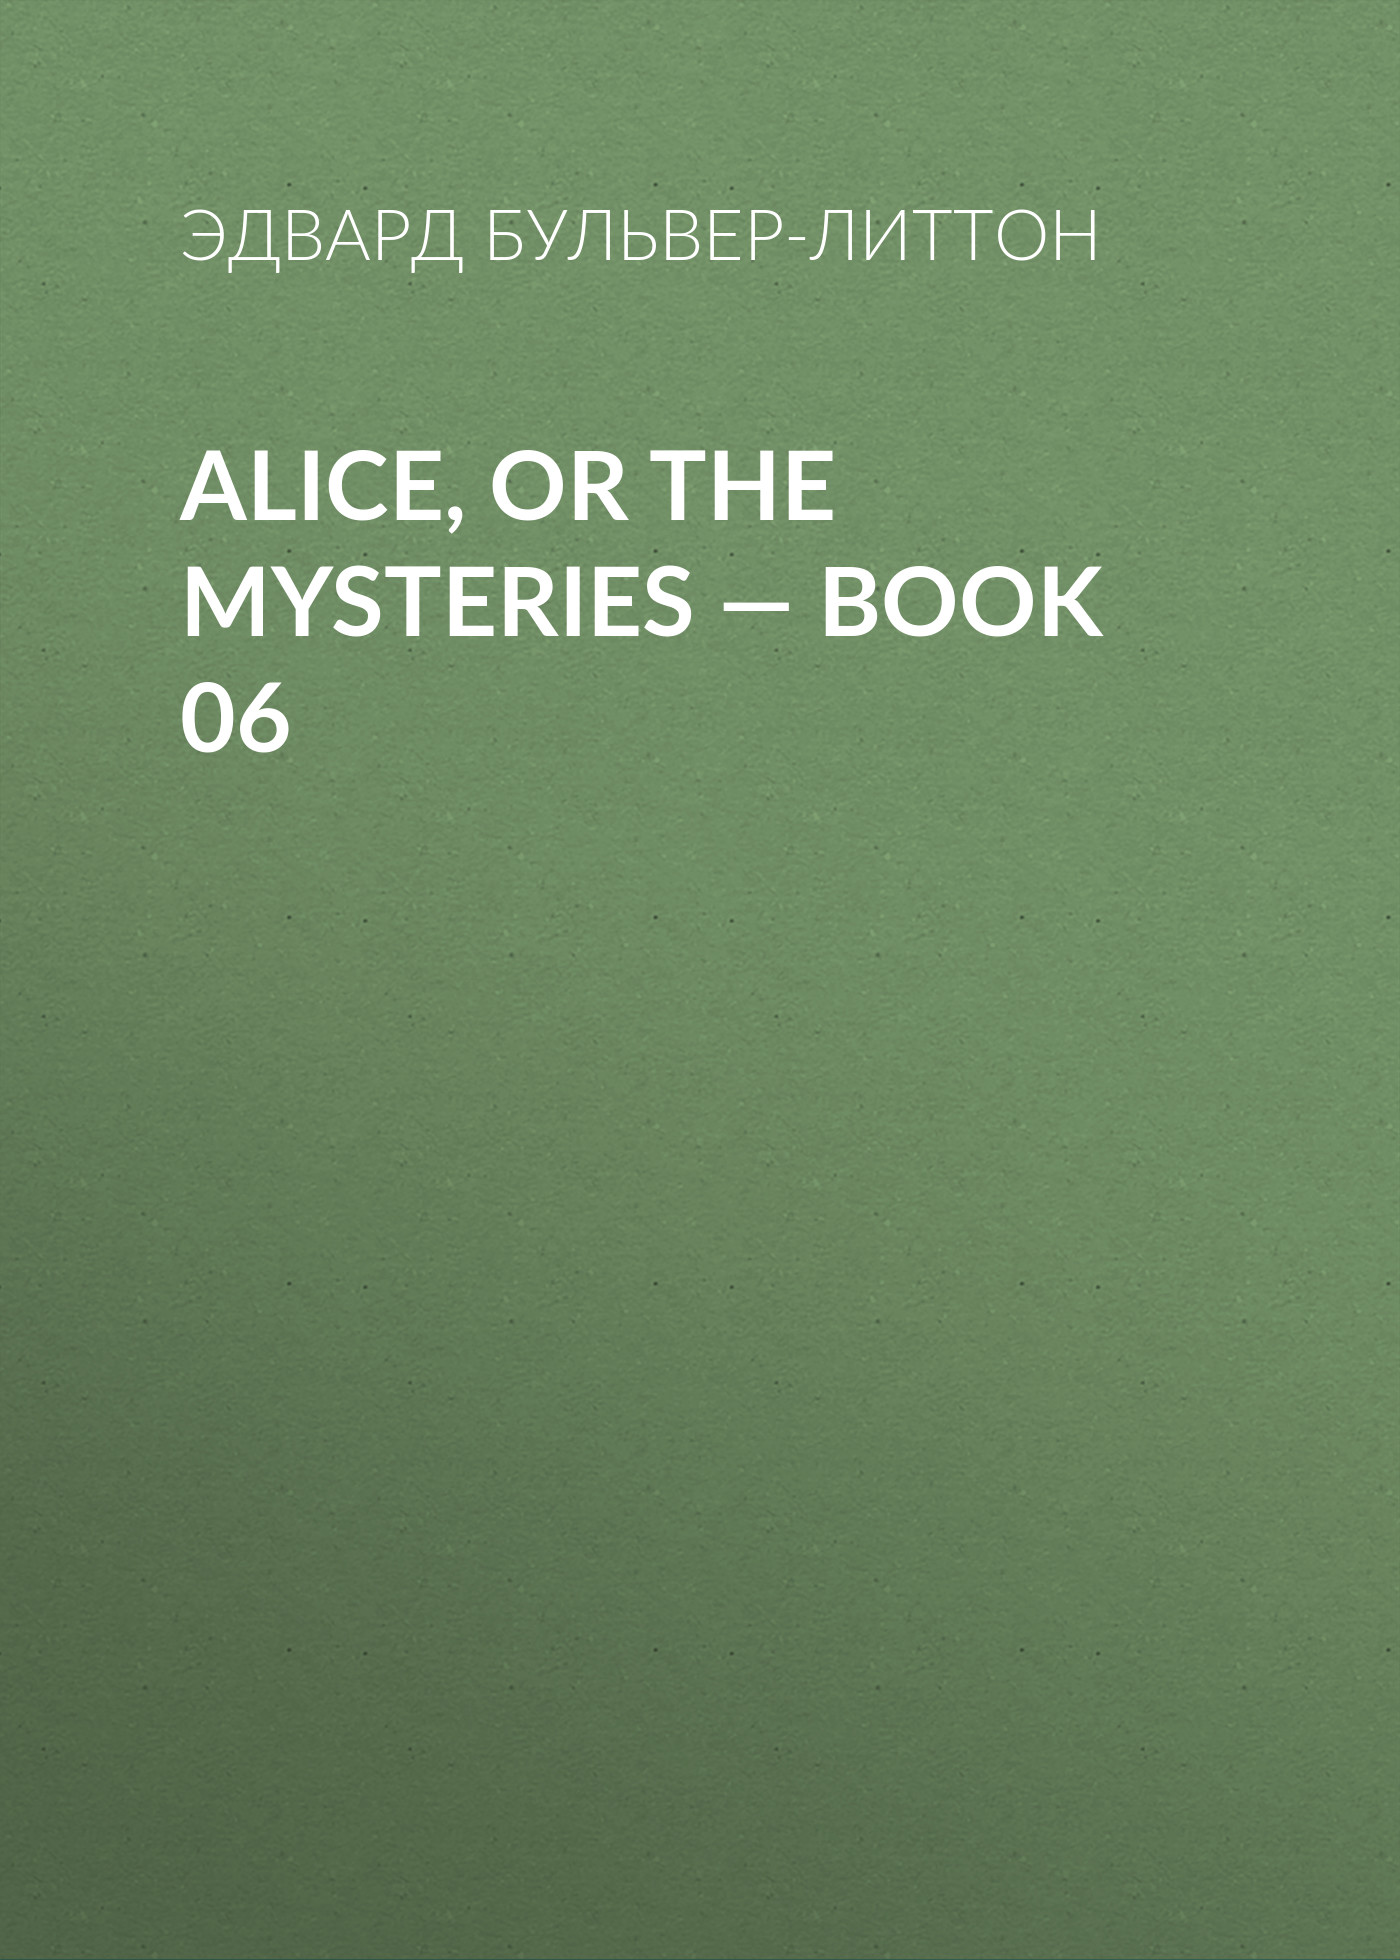 Alice, or the Mysteries — Book 06 ( Эдвард Бульвер-Литтон  )